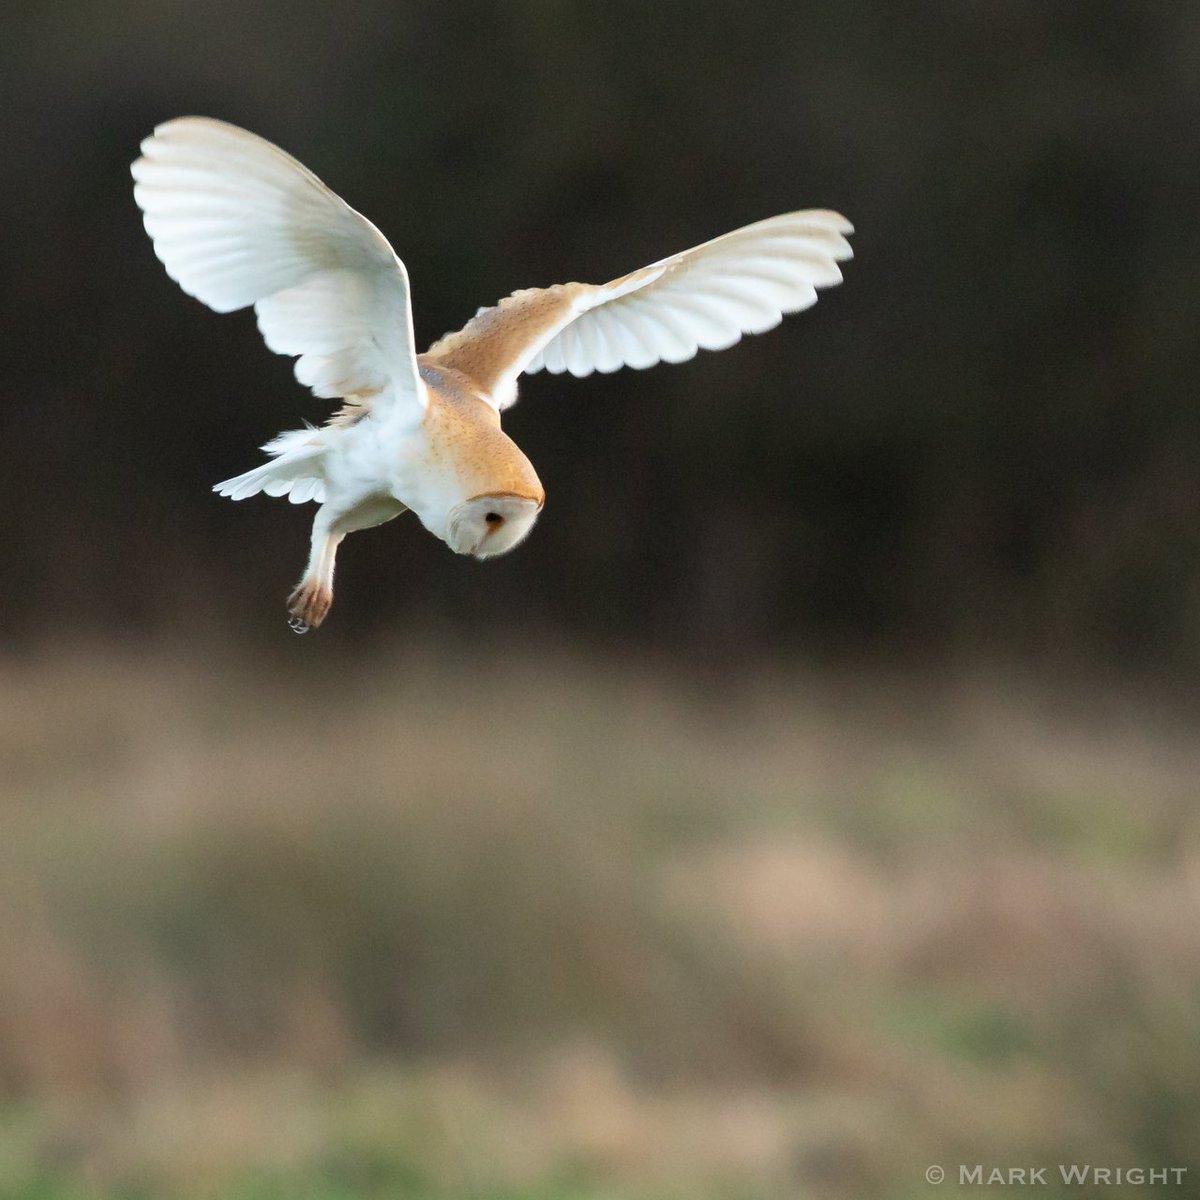 Barn Owl from earlier in the year Dorset @DorsetWildlife<br>http://pic.twitter.com/rTpAeuZVSo